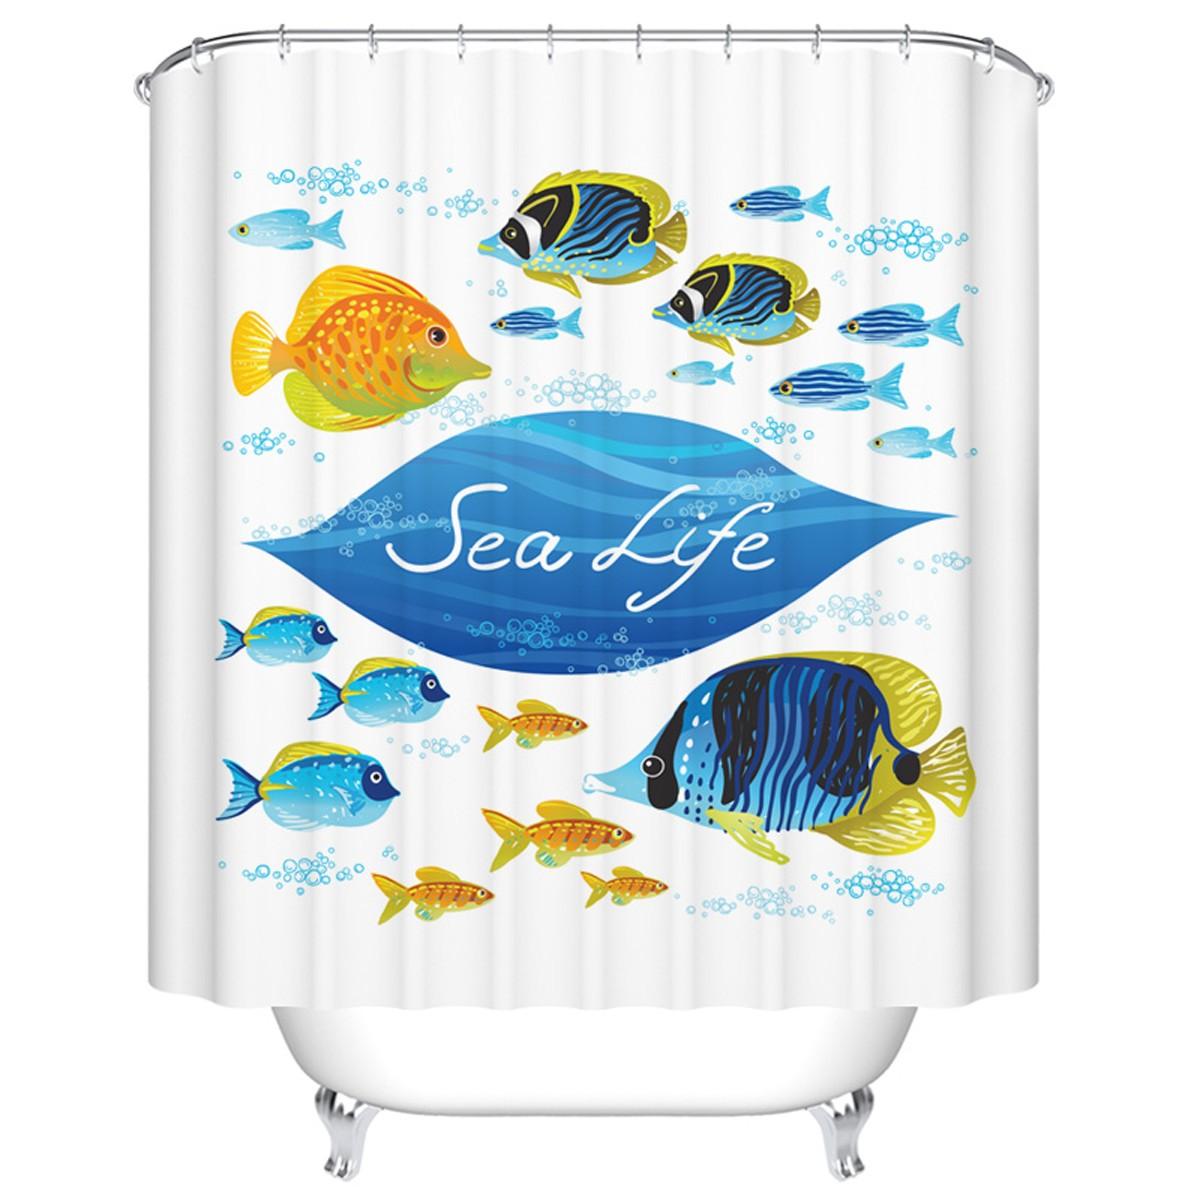 "Bathroom Waterproof Shower Curtain, 70"" W x 72"" H (DK-YT028)"